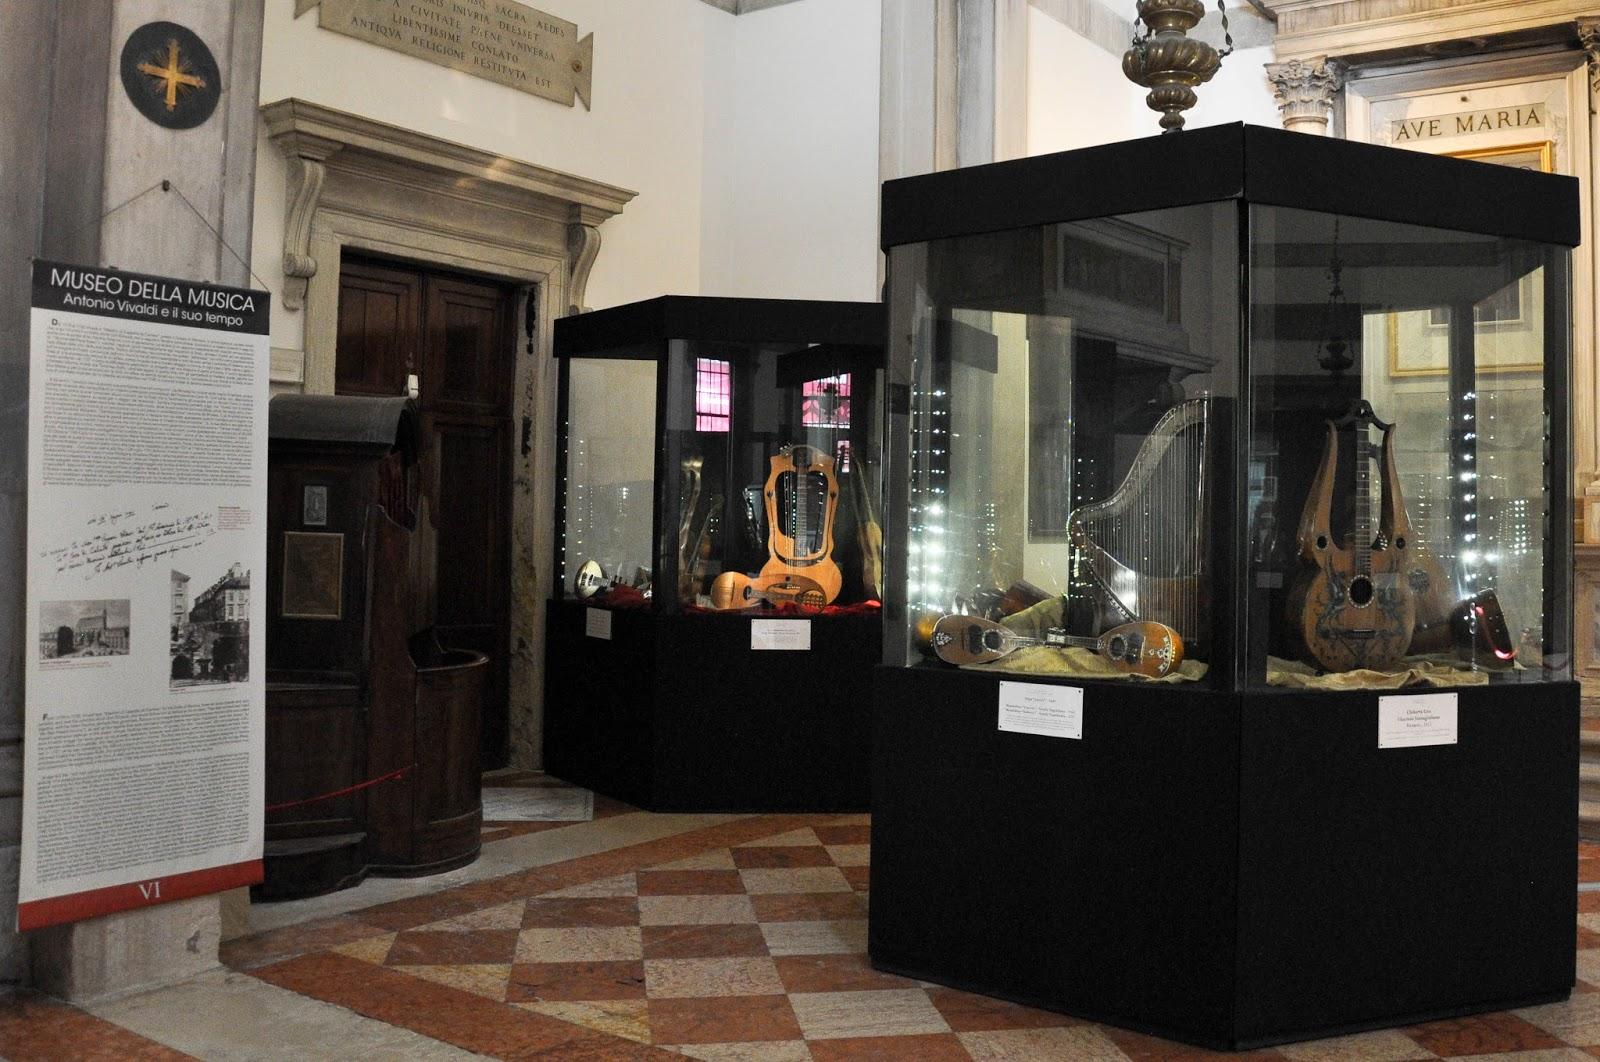 Exhibit cases, Museum of the Music, Venice, Italy